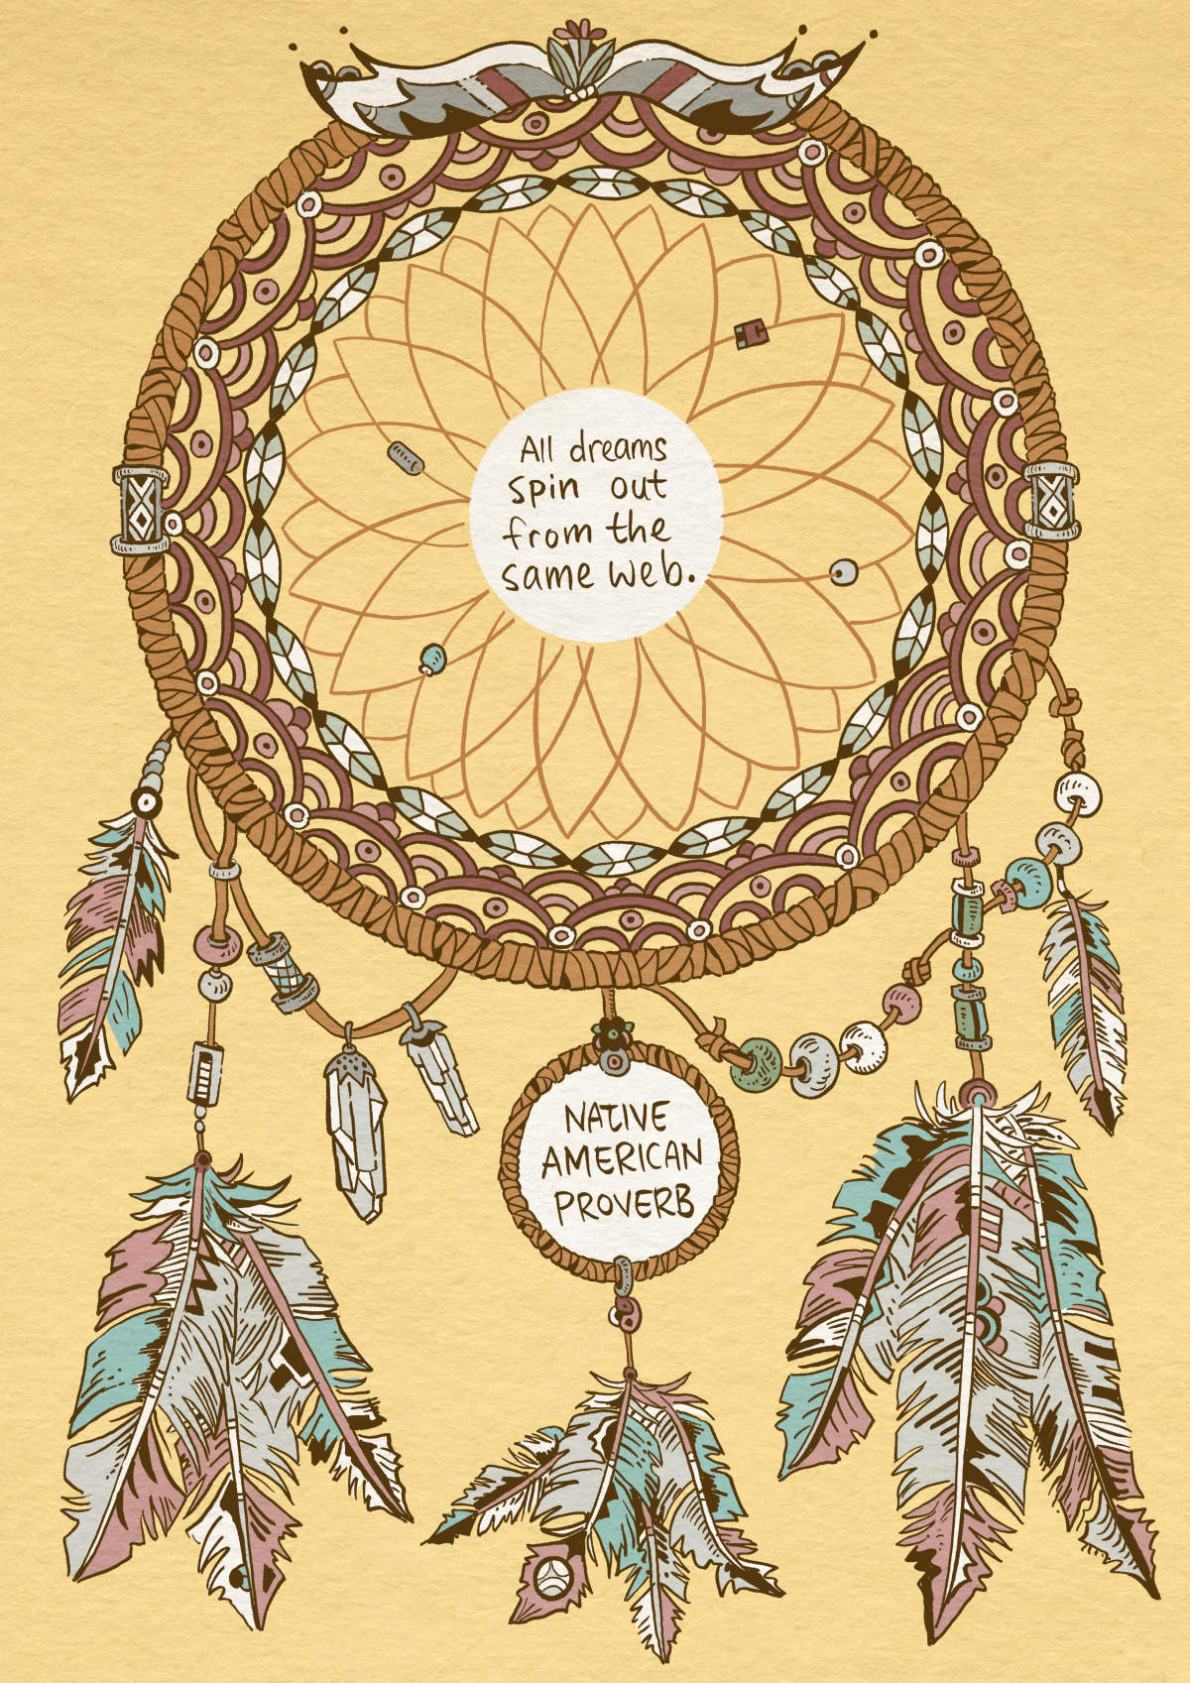 Native American Proverb - copy